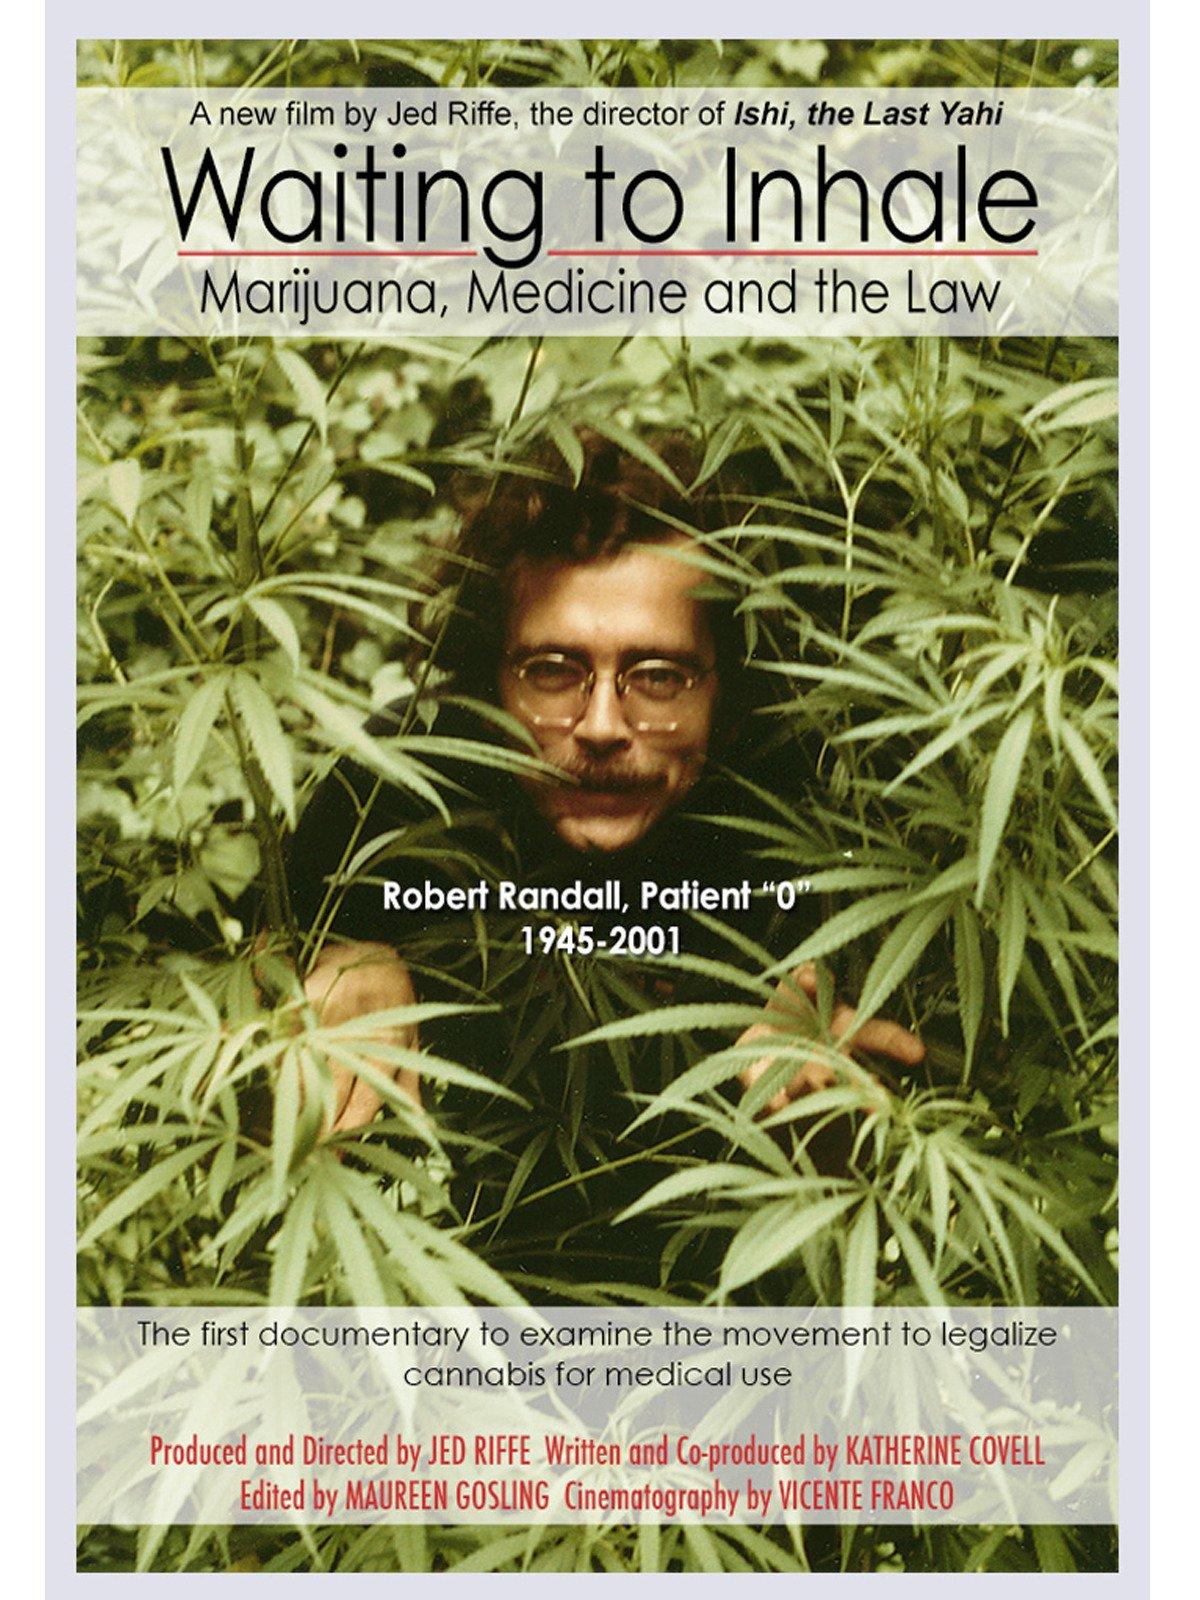 Waiting to Inhale: Marijuana, Medicine and the Law